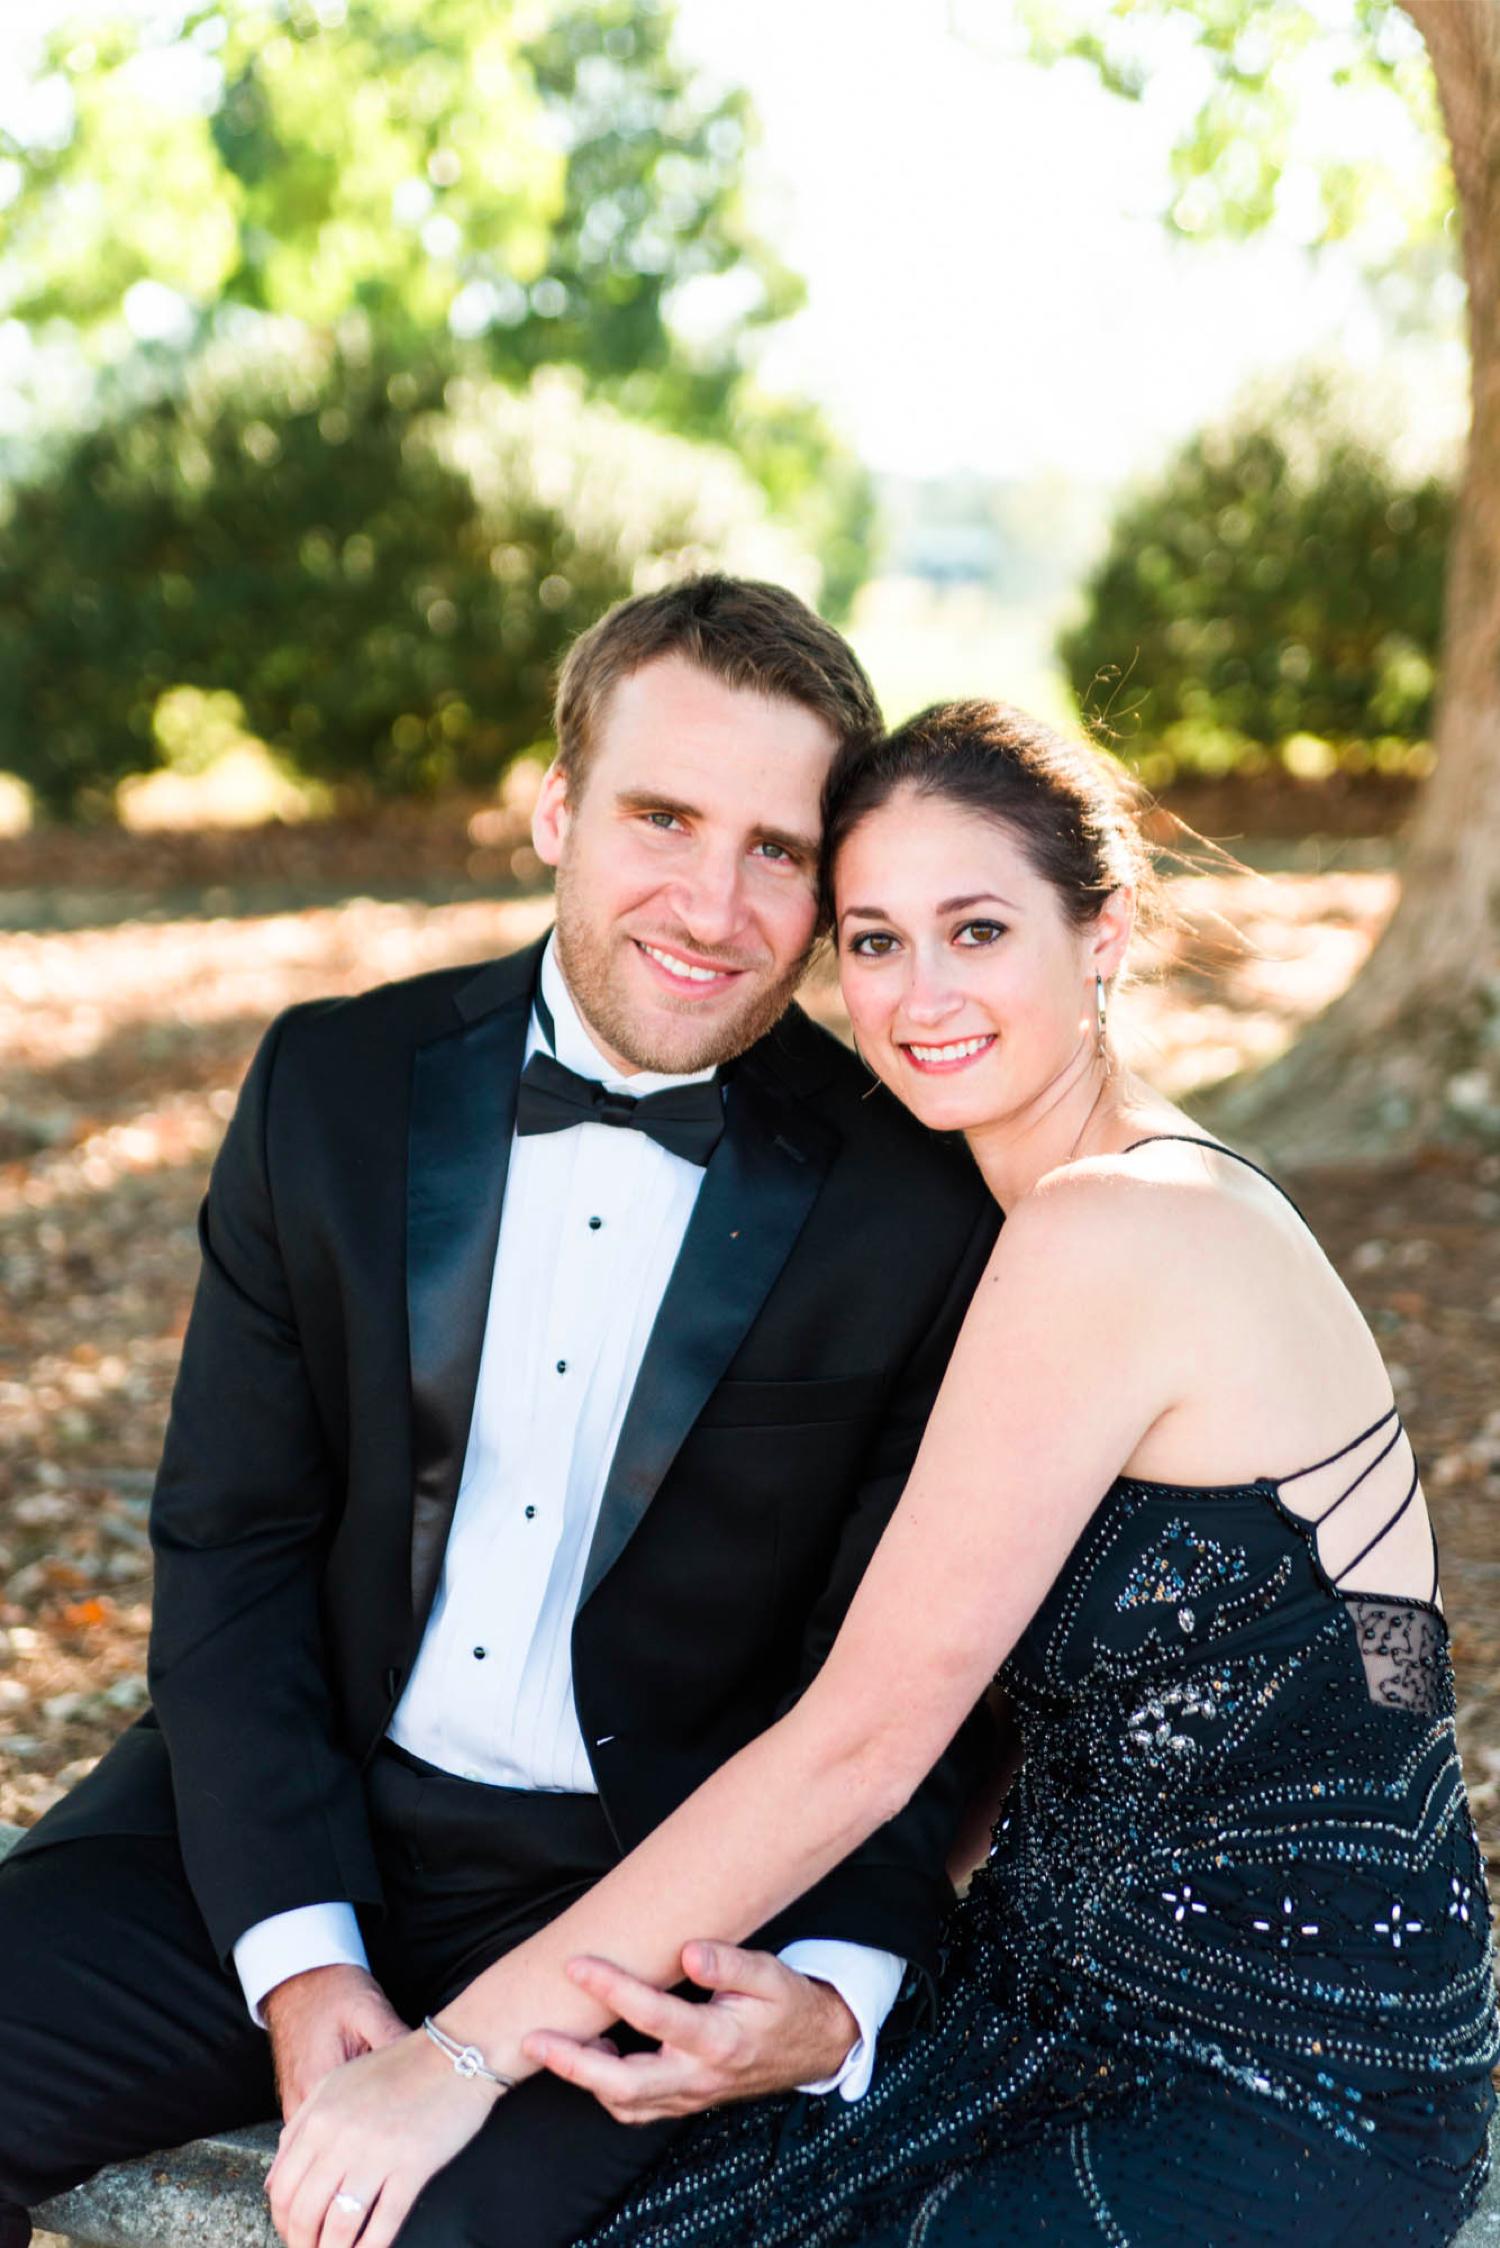 Image 5 of Jason and Lauren